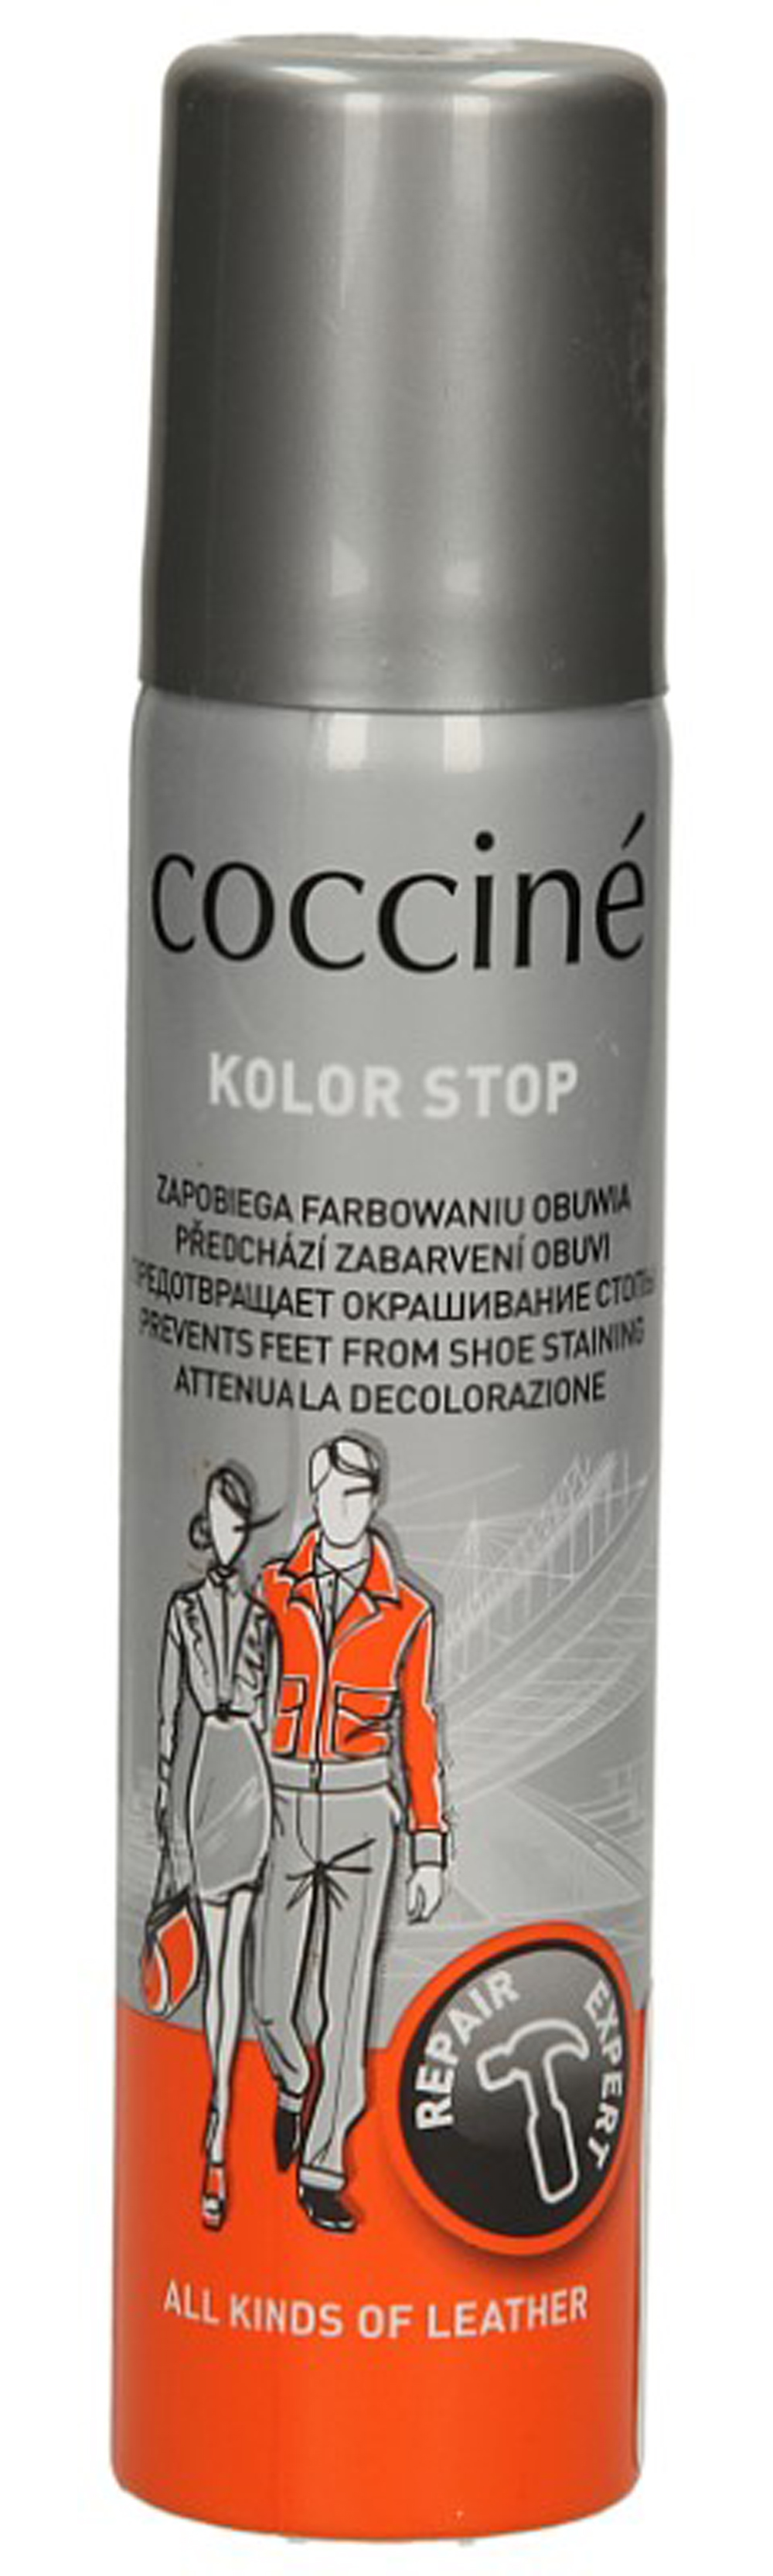 COCCINE KOLOR STOP 50ML